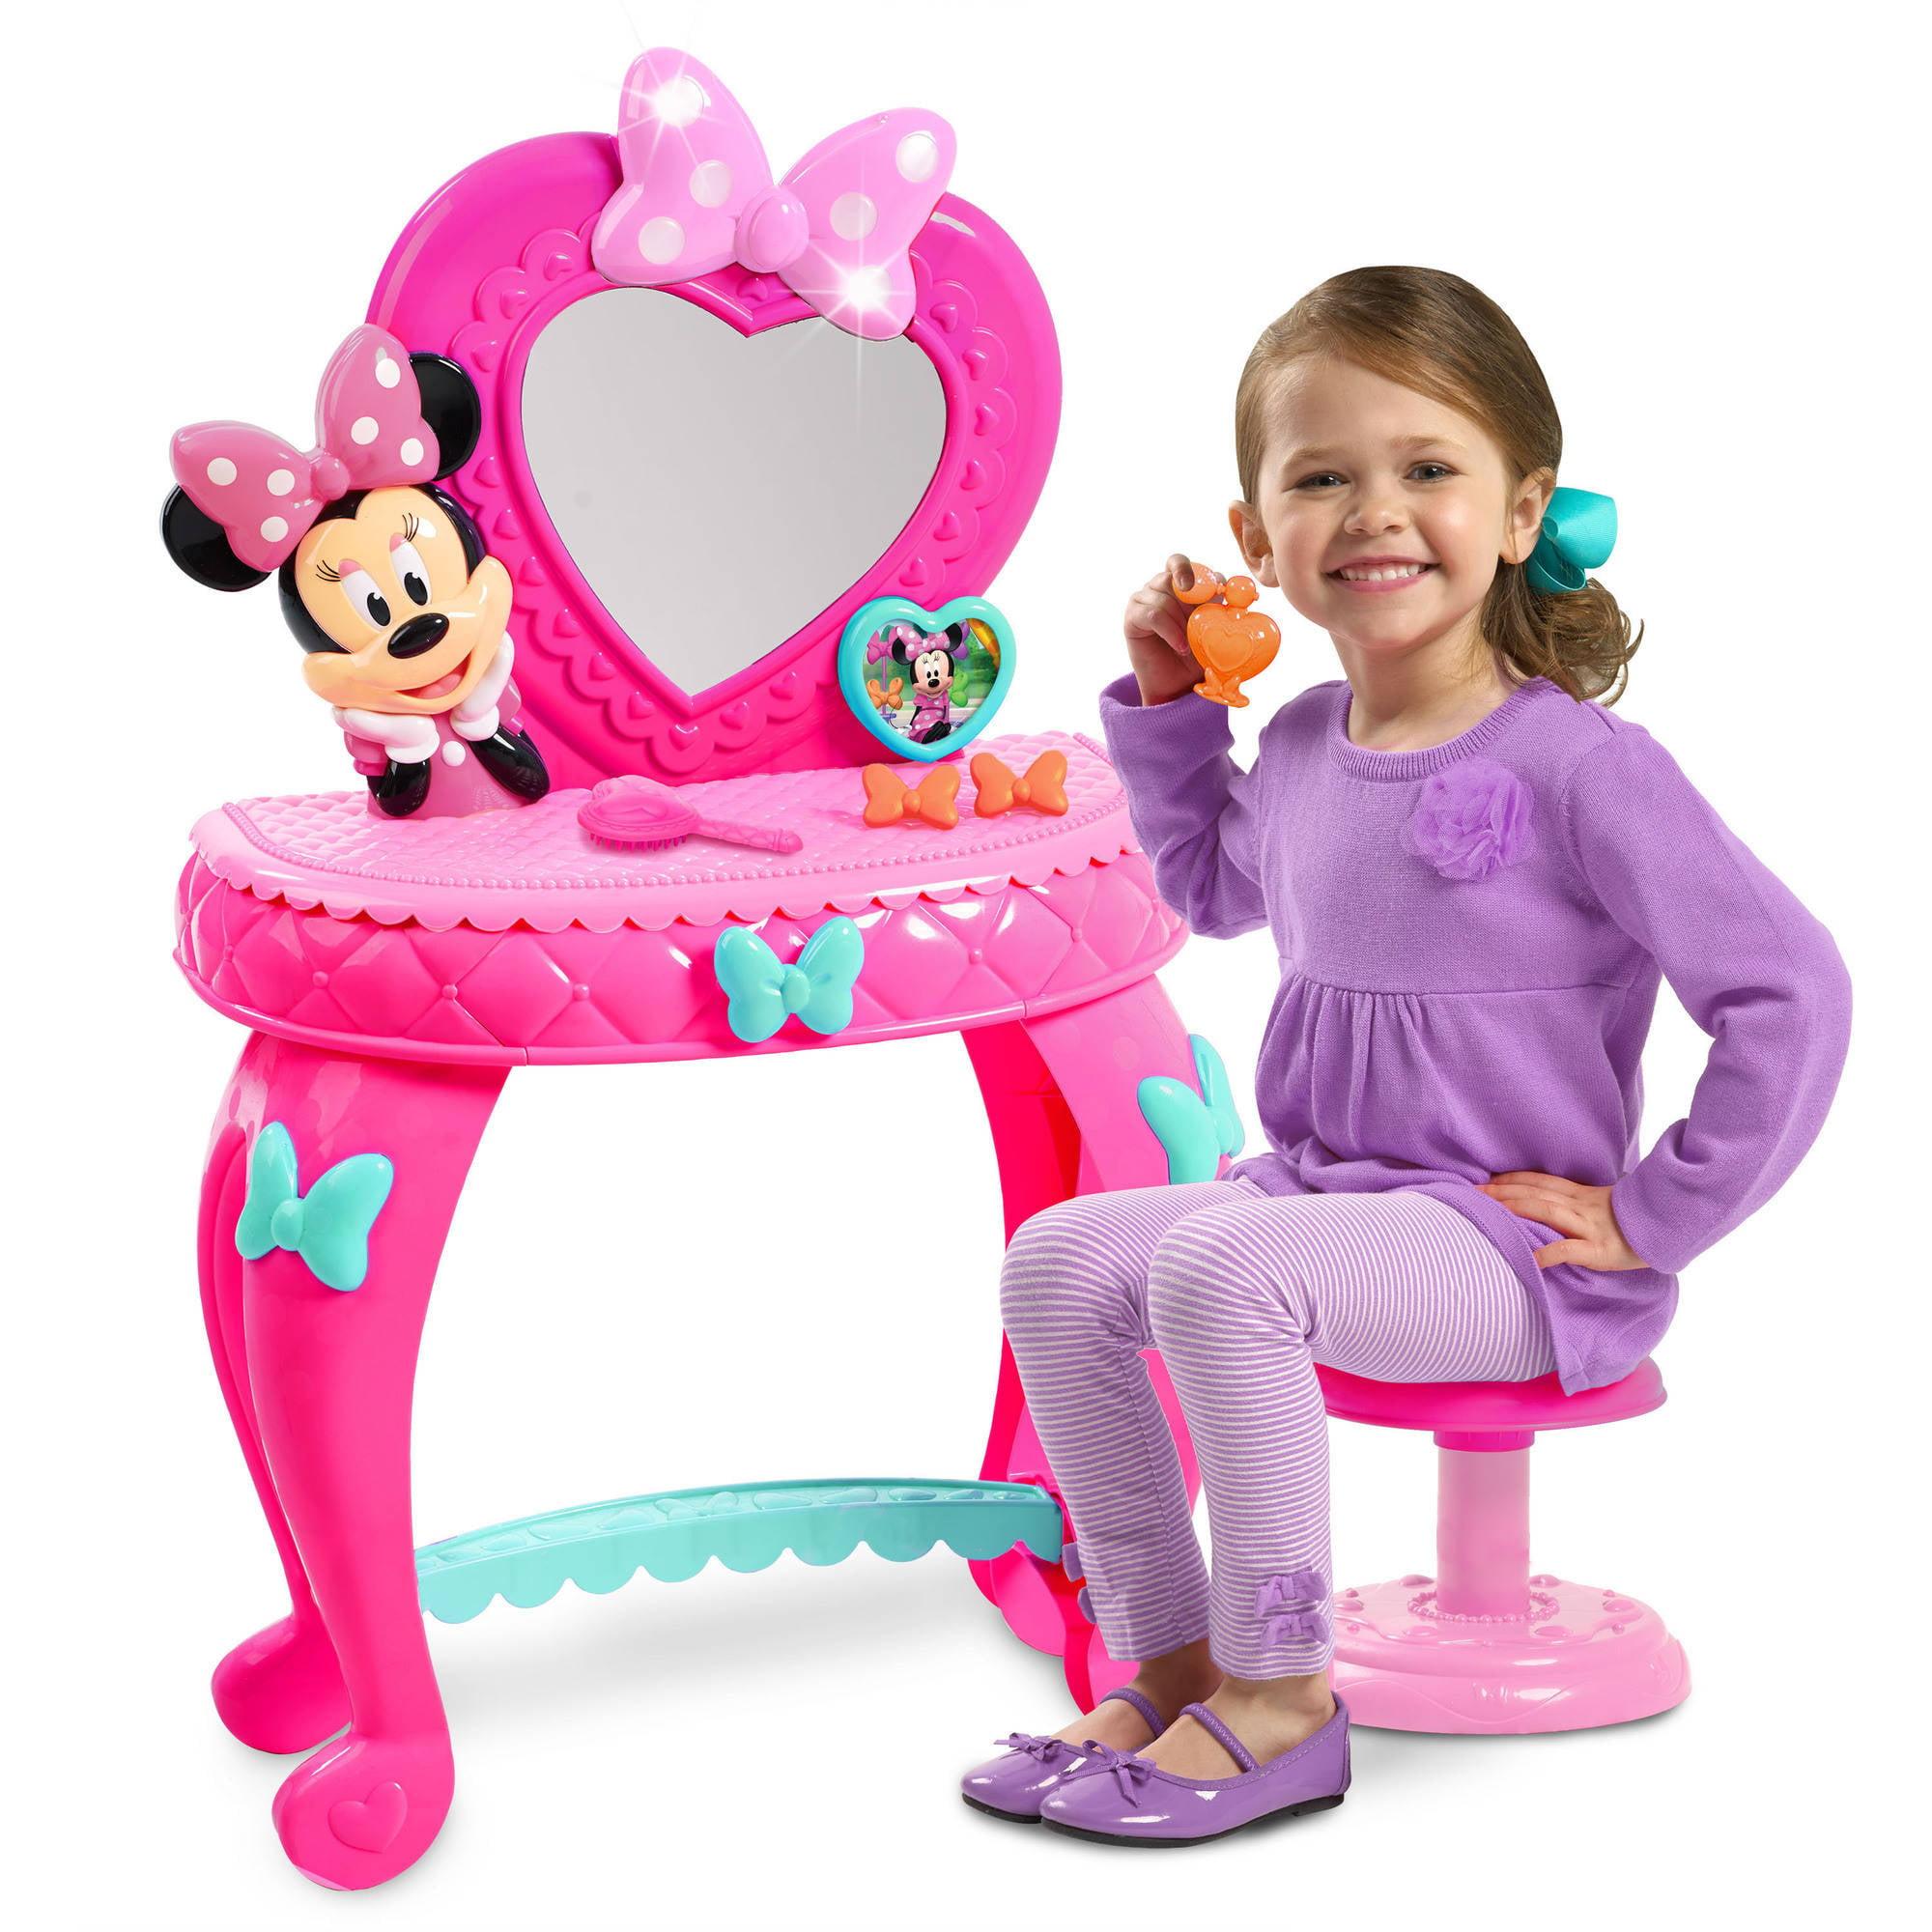 Disney Minnie Bow Tique Bowdazzling Vanity